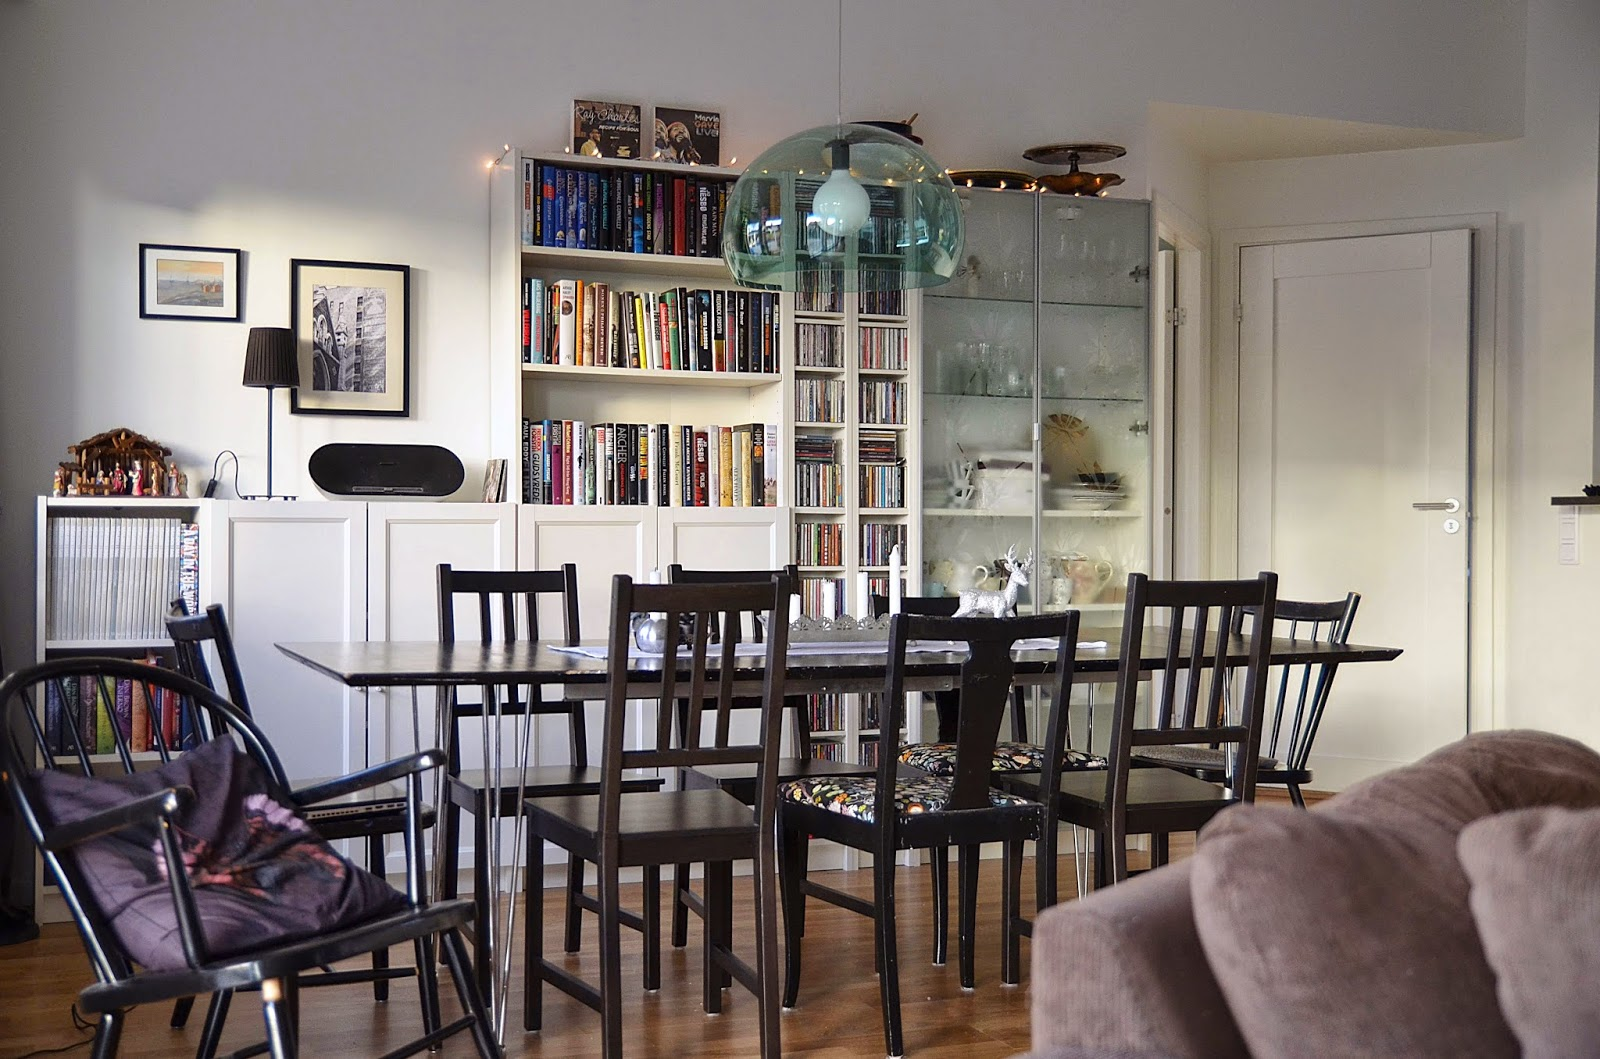 prio två, eksjöhus, bygga hus, inspiration, vardagsrum, livingroom, interior design